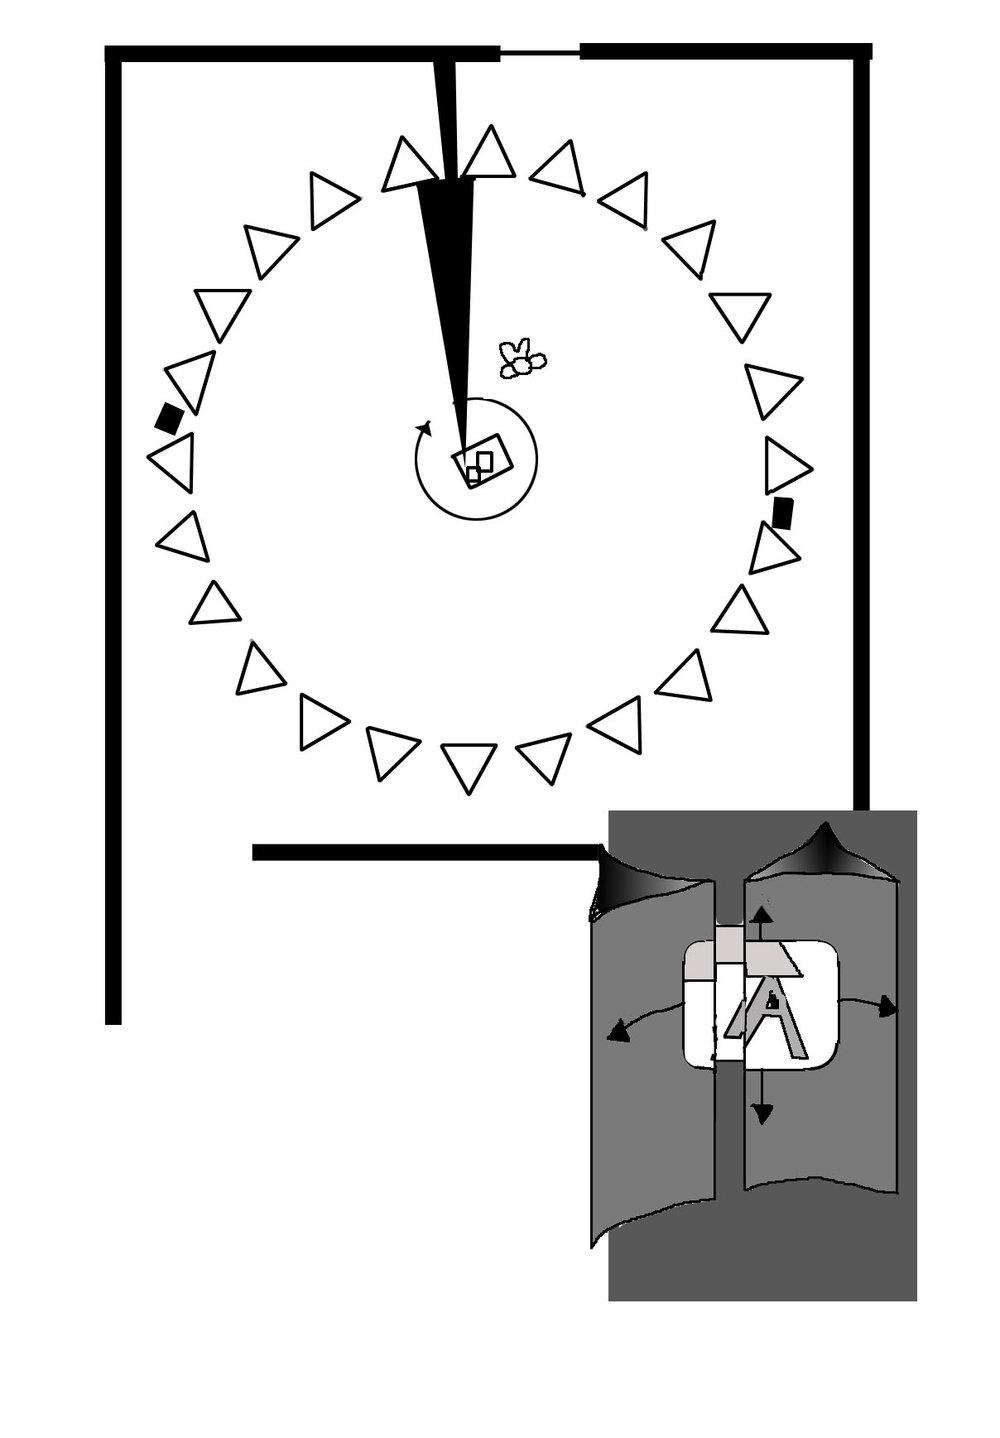 Pong Ping Pong installation plan (1971)